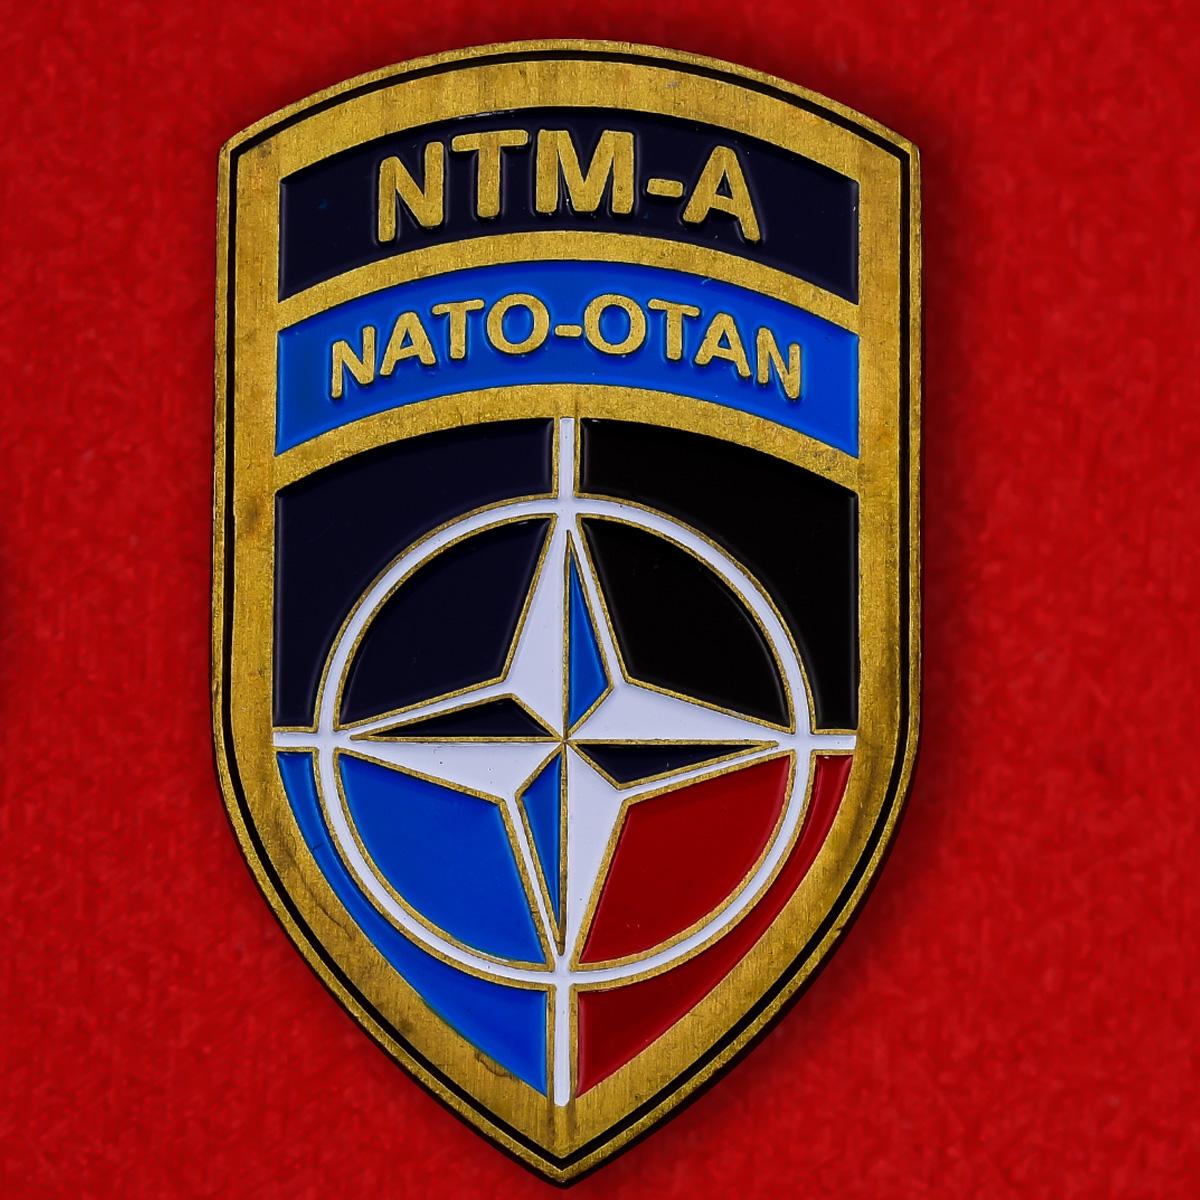 Челлендж коин Учебной миссии НАТО в Афганистане